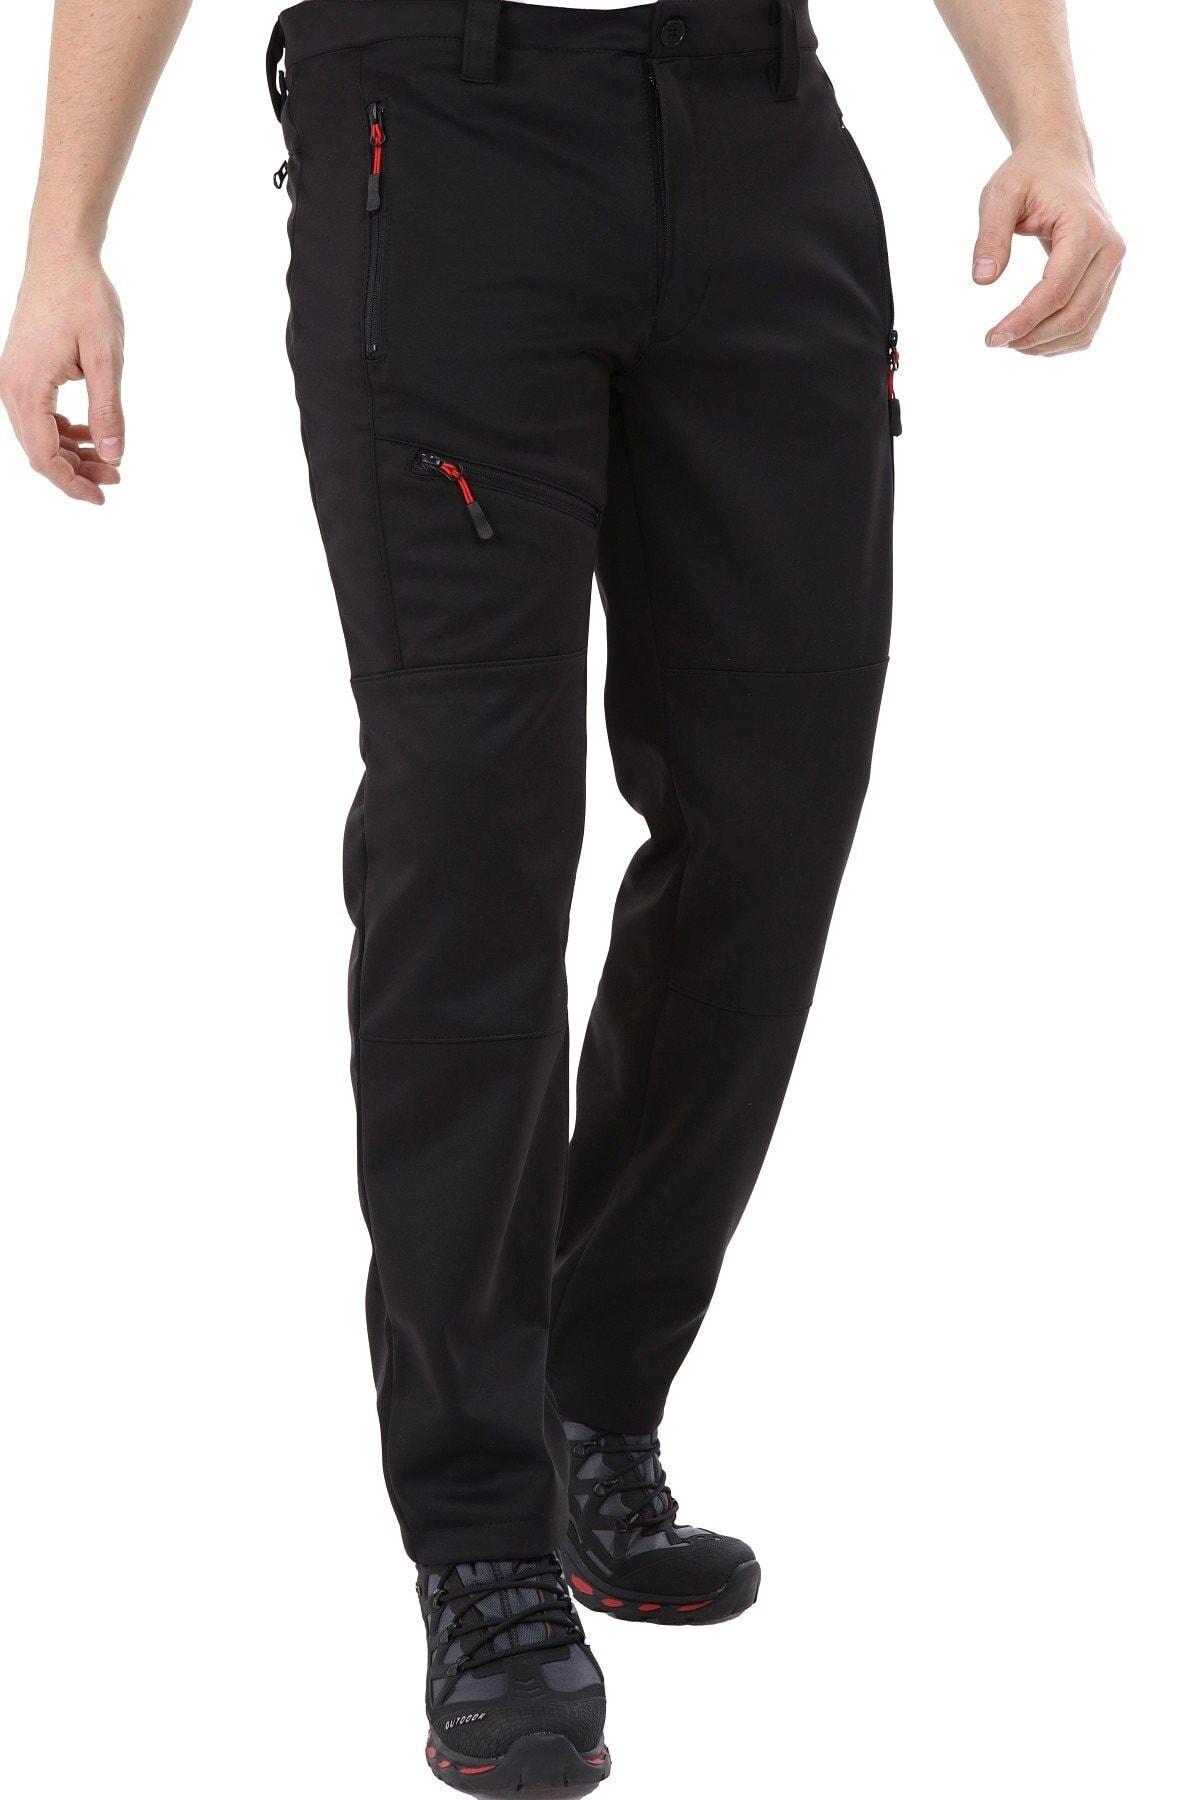 GHASSY CO. Erkek Tactical Outdoor Su Geçirmez Siyah Softshell Pantolon 2